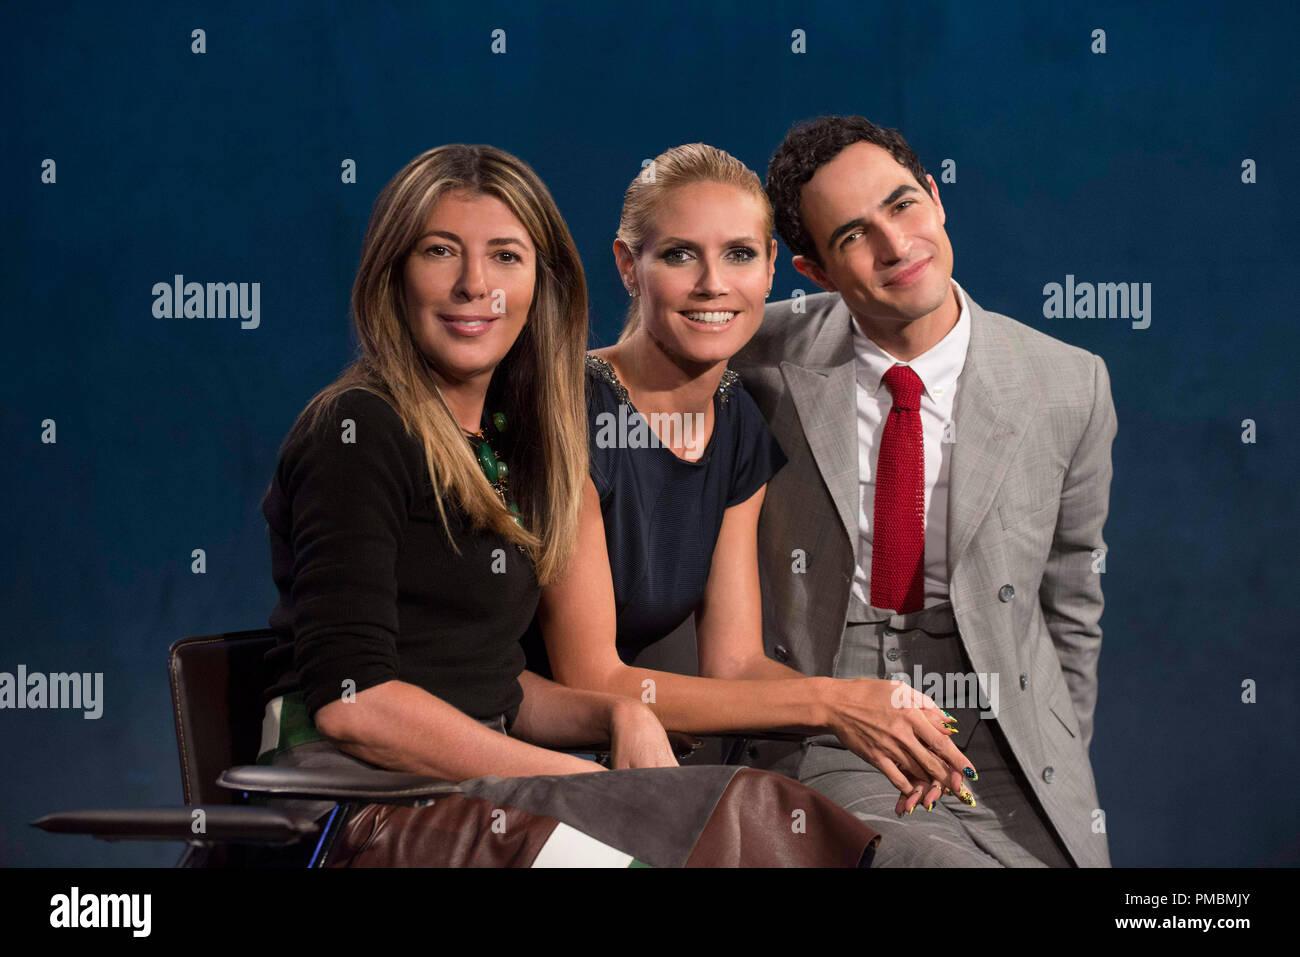 Nina Garcia, Heidi Klum and Zac Posen, 'Project Runway', Season 13 - Stock Image